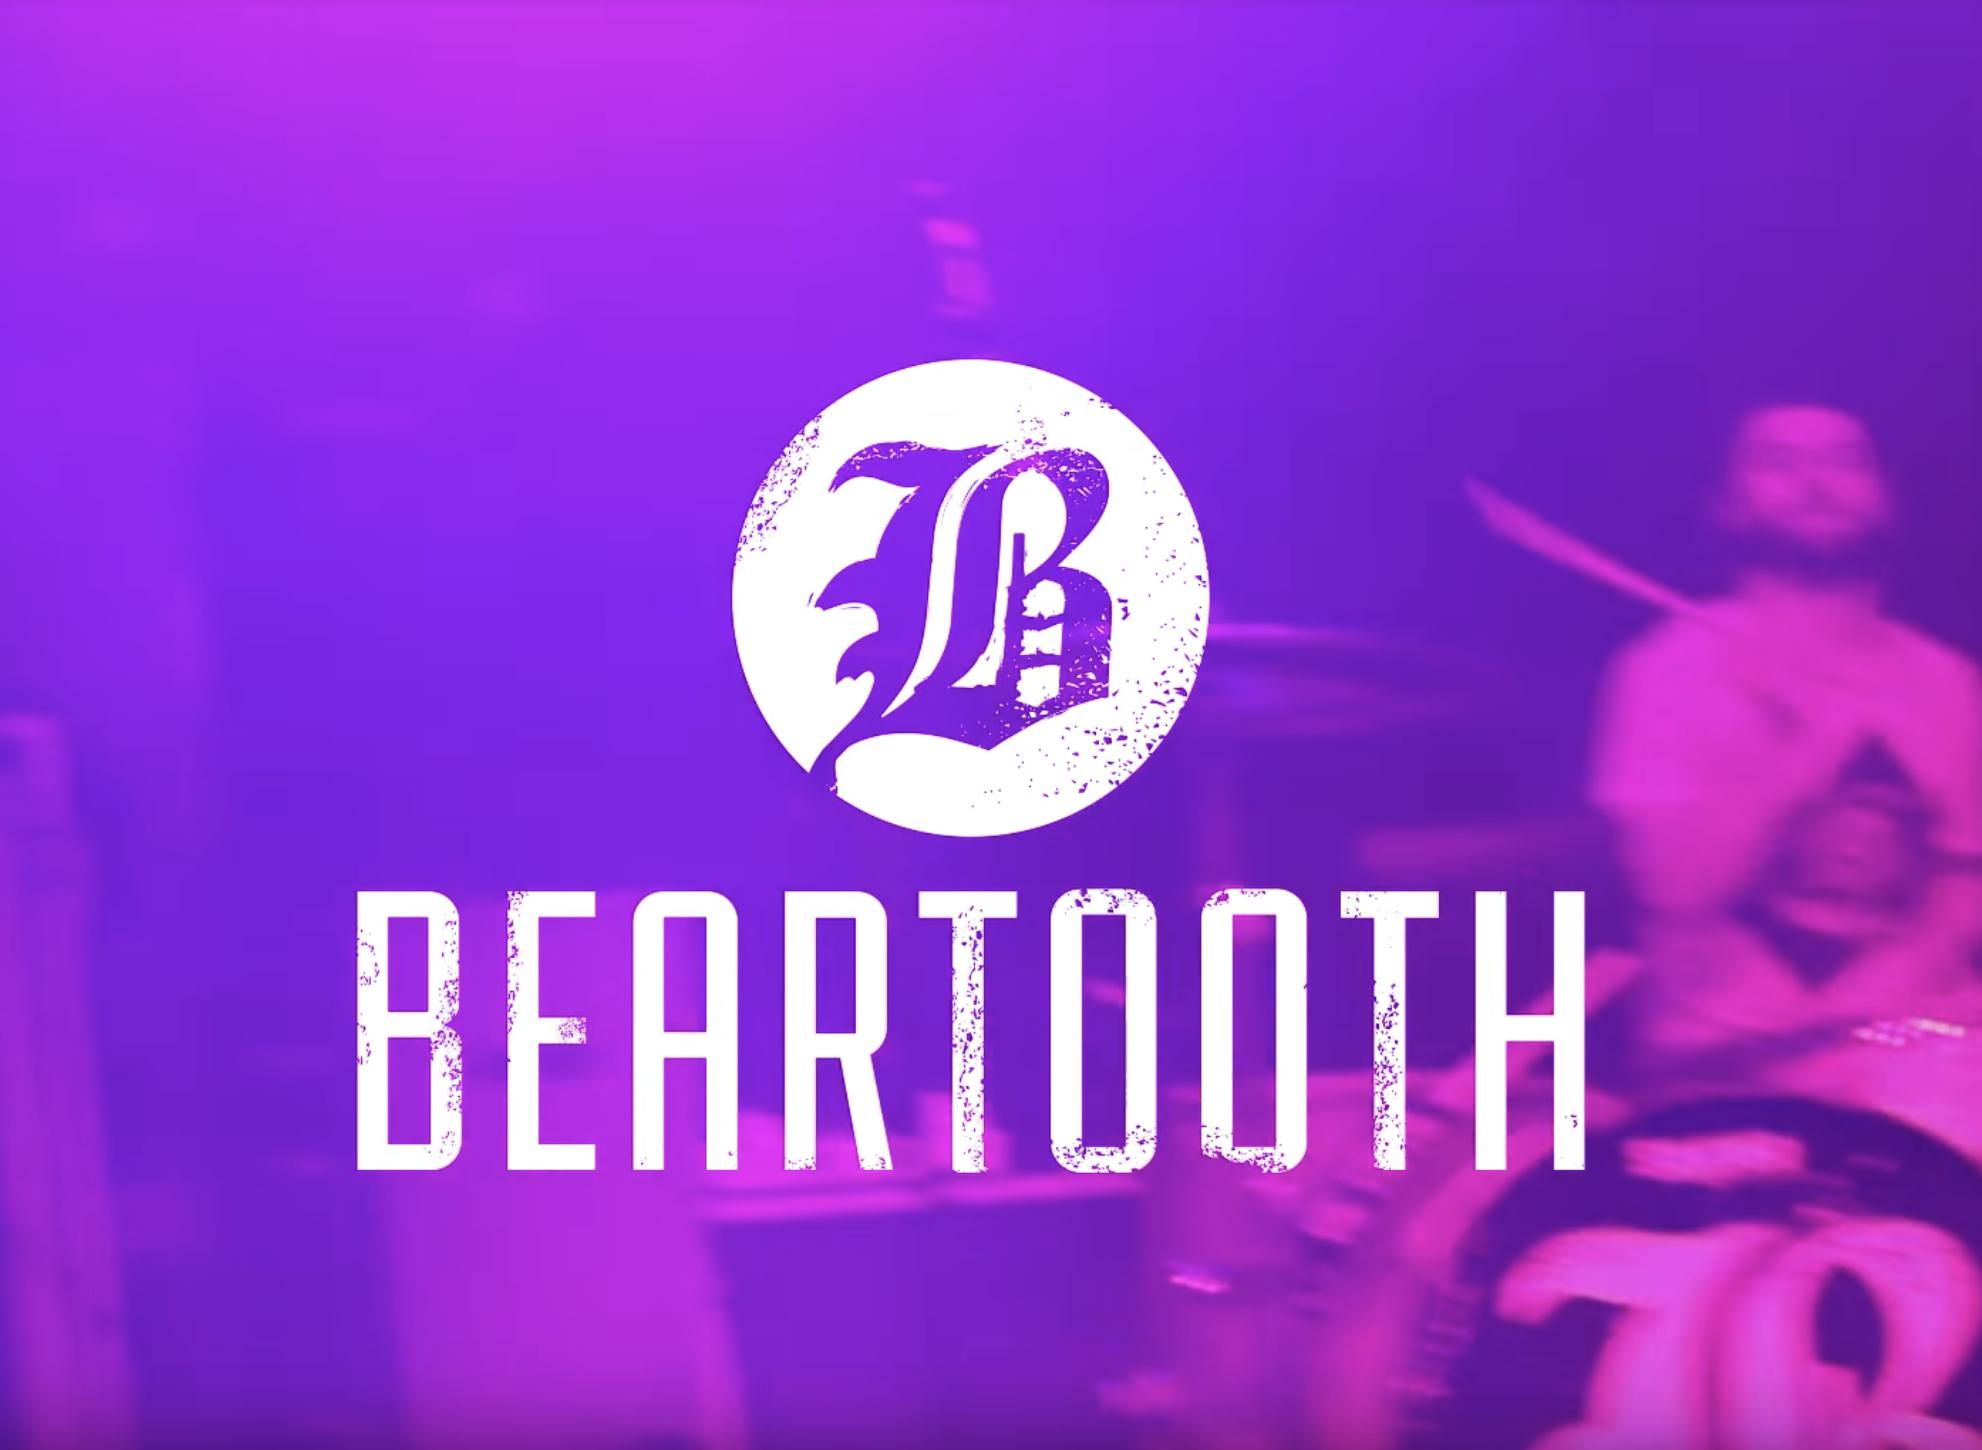 Beartooth Live Music Video - Body Bag